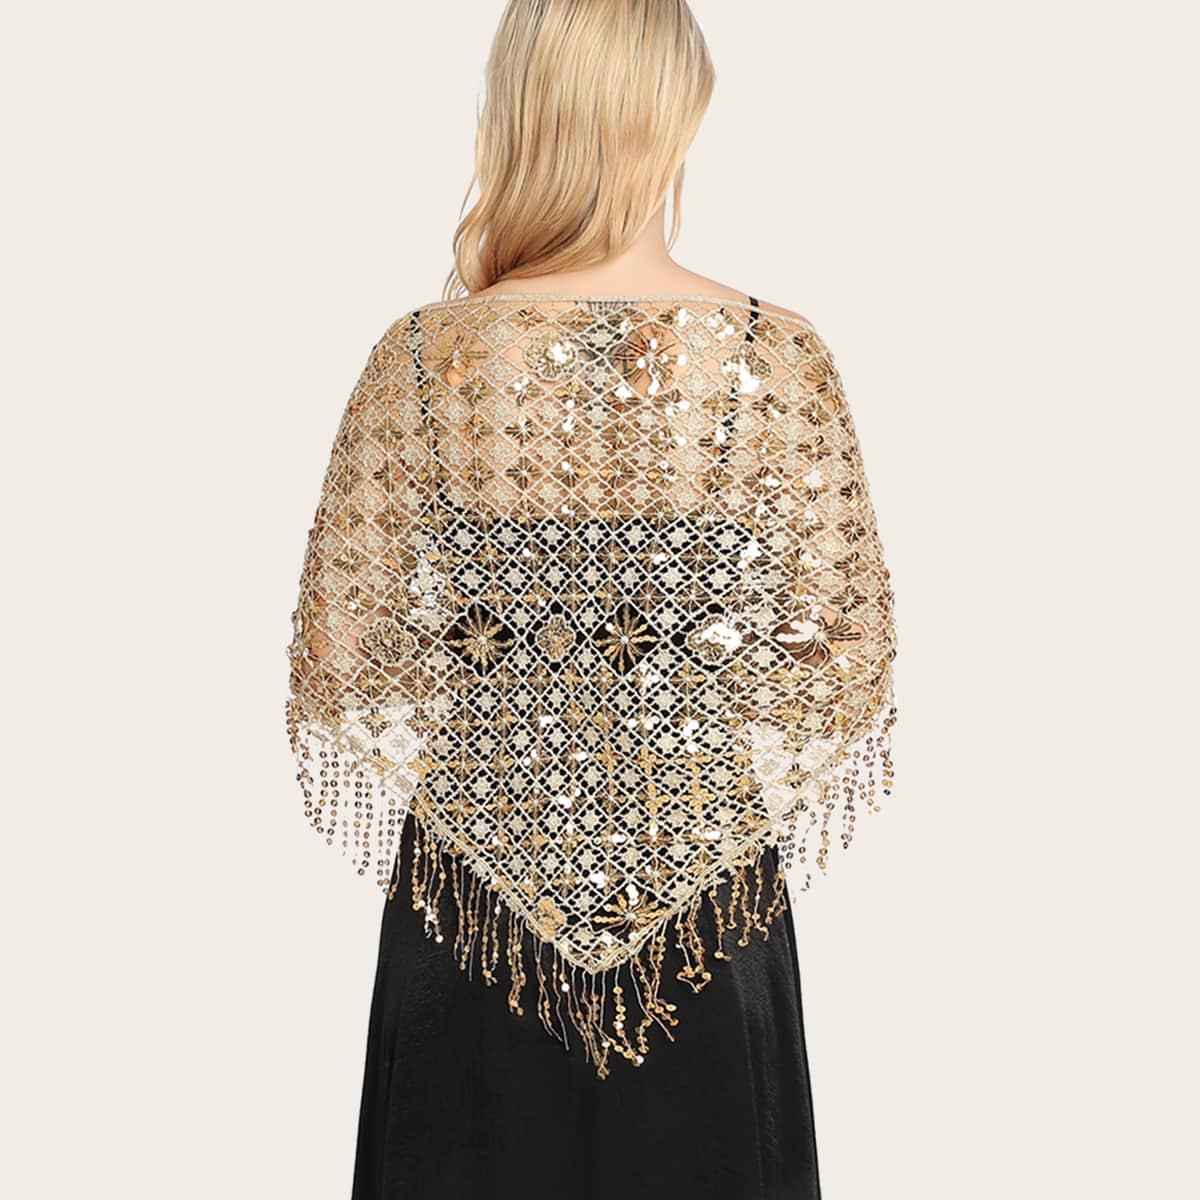 shein Sequin Decor sjaal